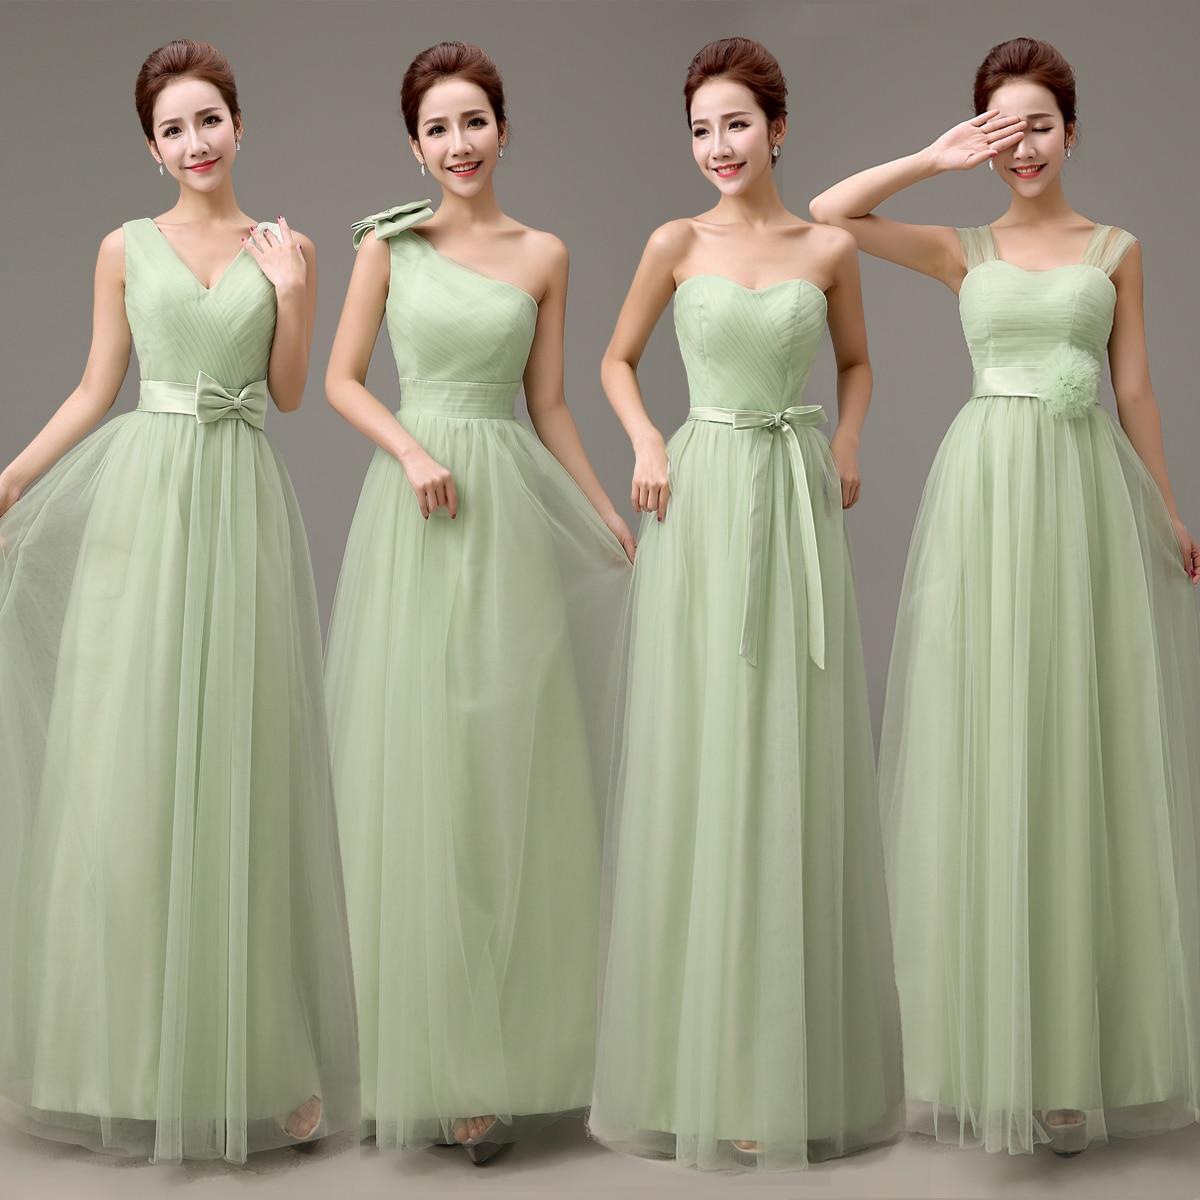 Popular Modest Bridesmaid Dresses under 100-Buy Cheap Modest ...